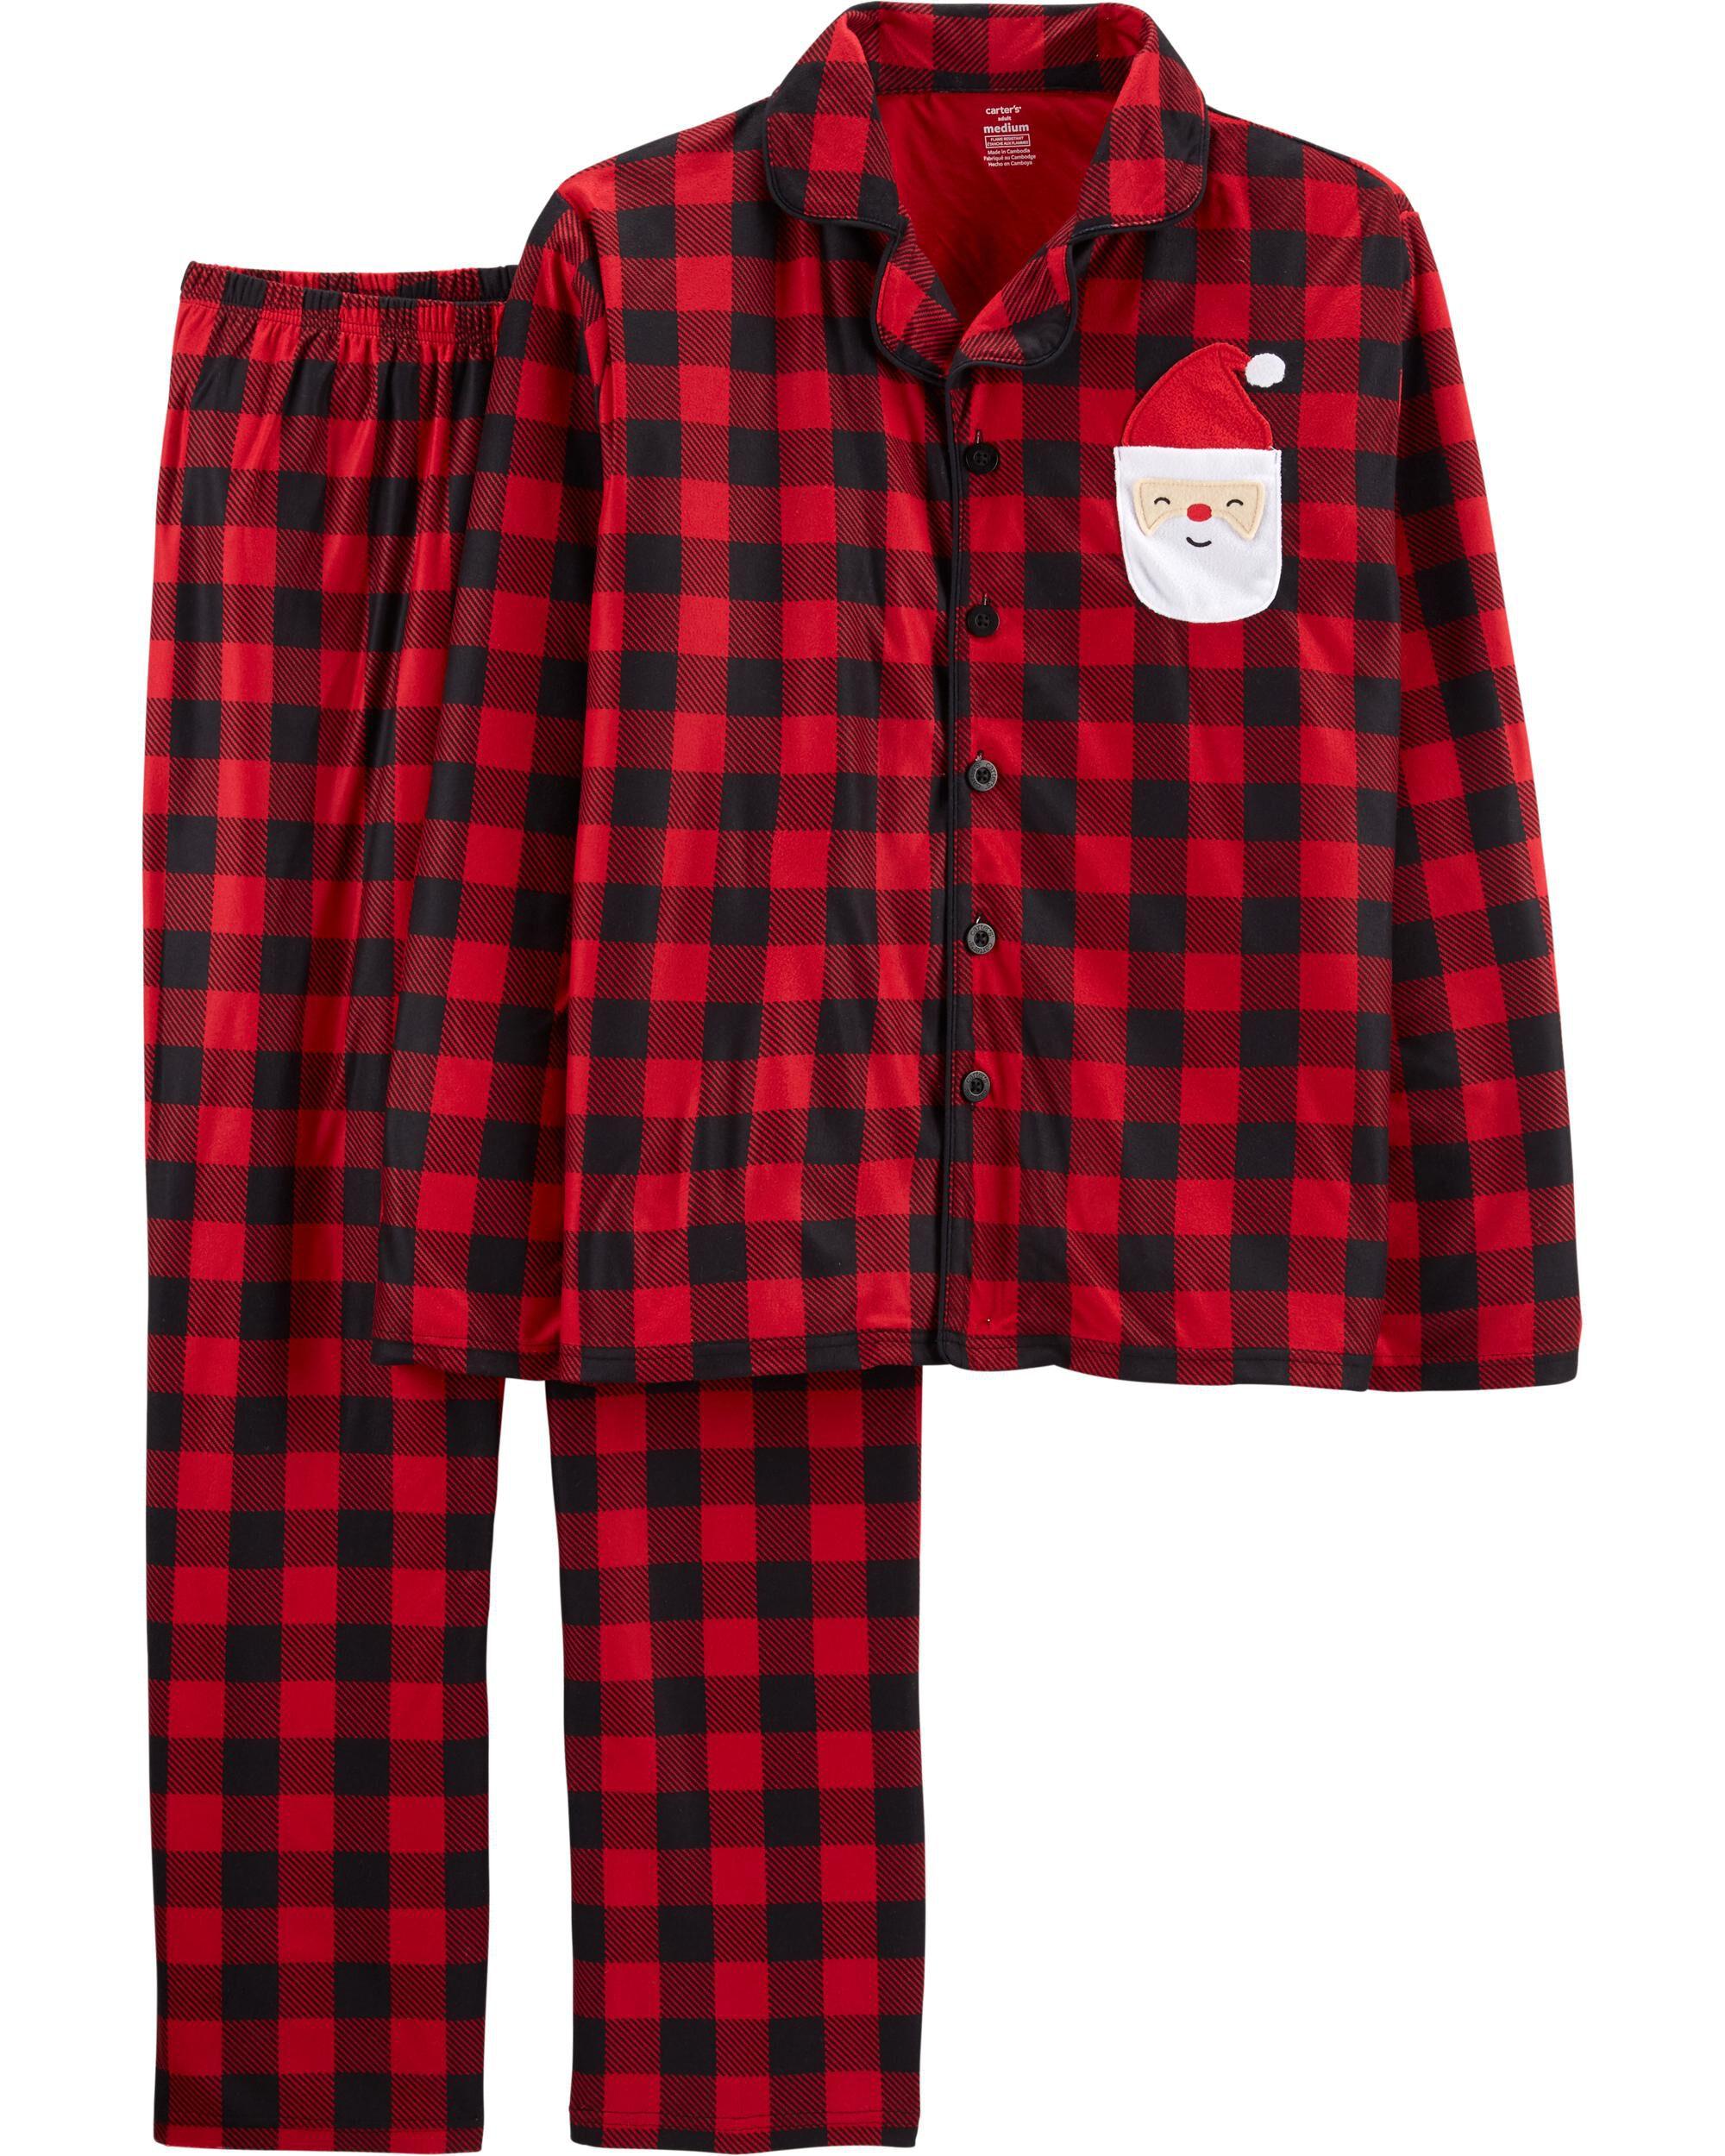 2-Piece Santa Buffalo Check Coat Style Fleece PJs for Adults